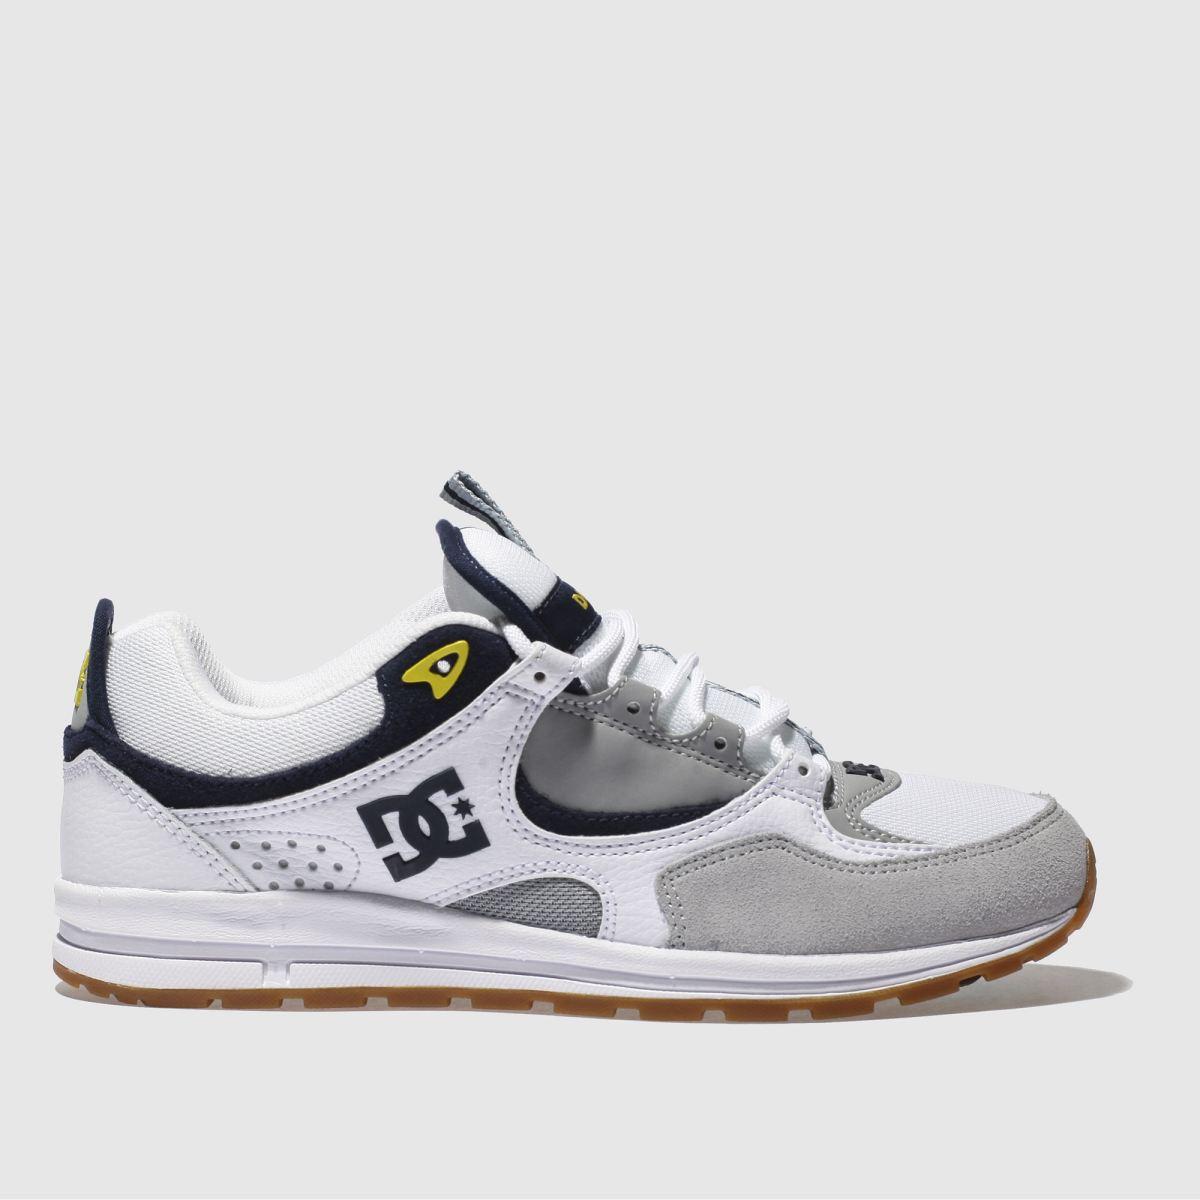 dc shoes Dc Shoes White & Grey Kalis Lite Trainers